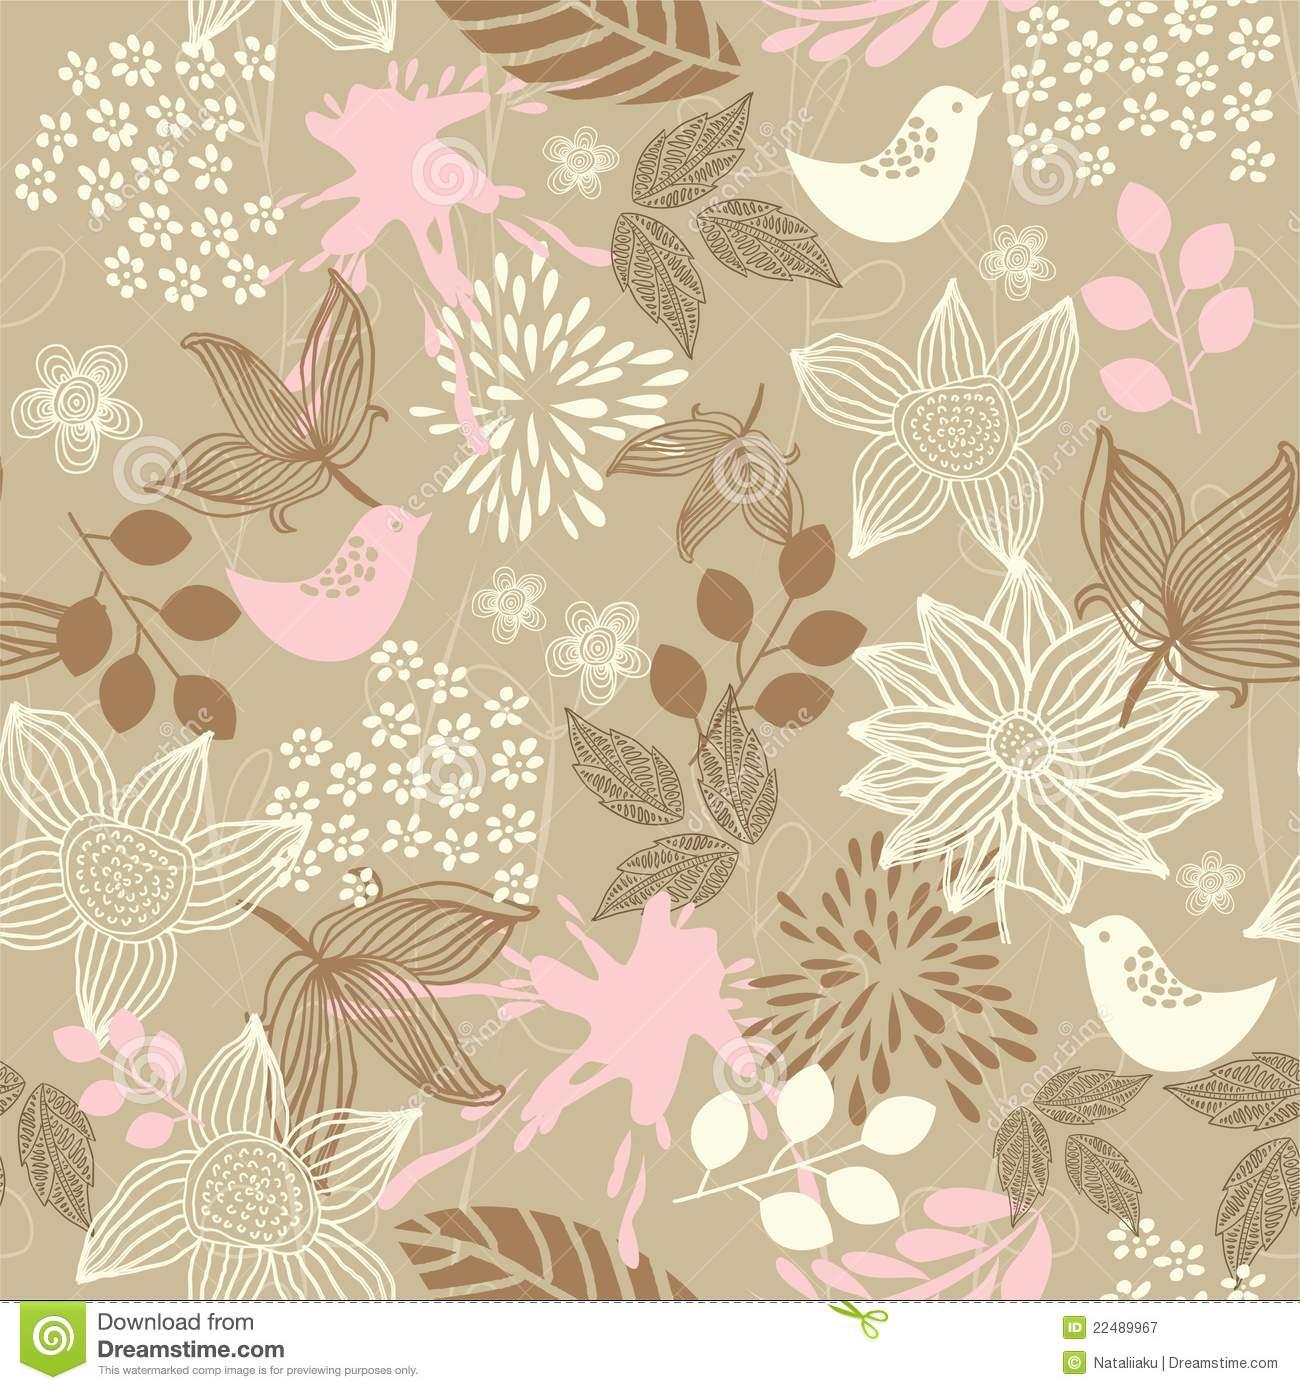 Displaying 14 Images For   Vintage Bird Wallpaper Pattern 1300x1390